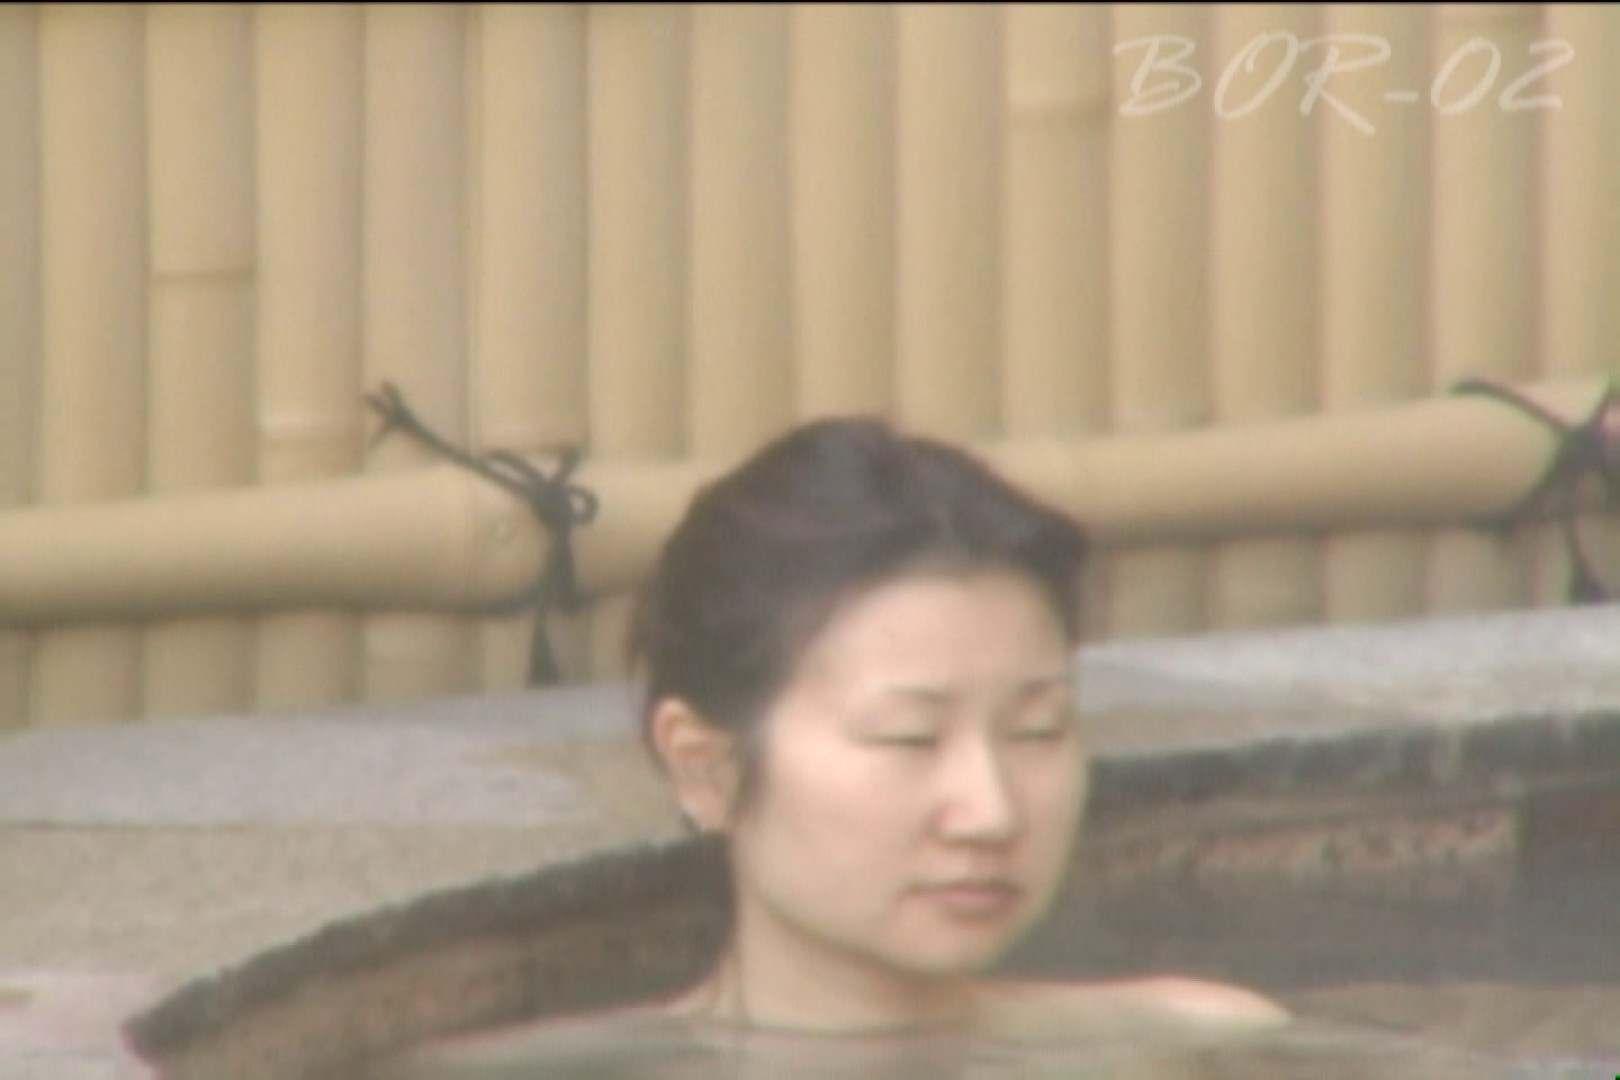 Aquaな露天風呂Vol.476 盗撮師作品 オマンコ無修正動画無料 85pic 14